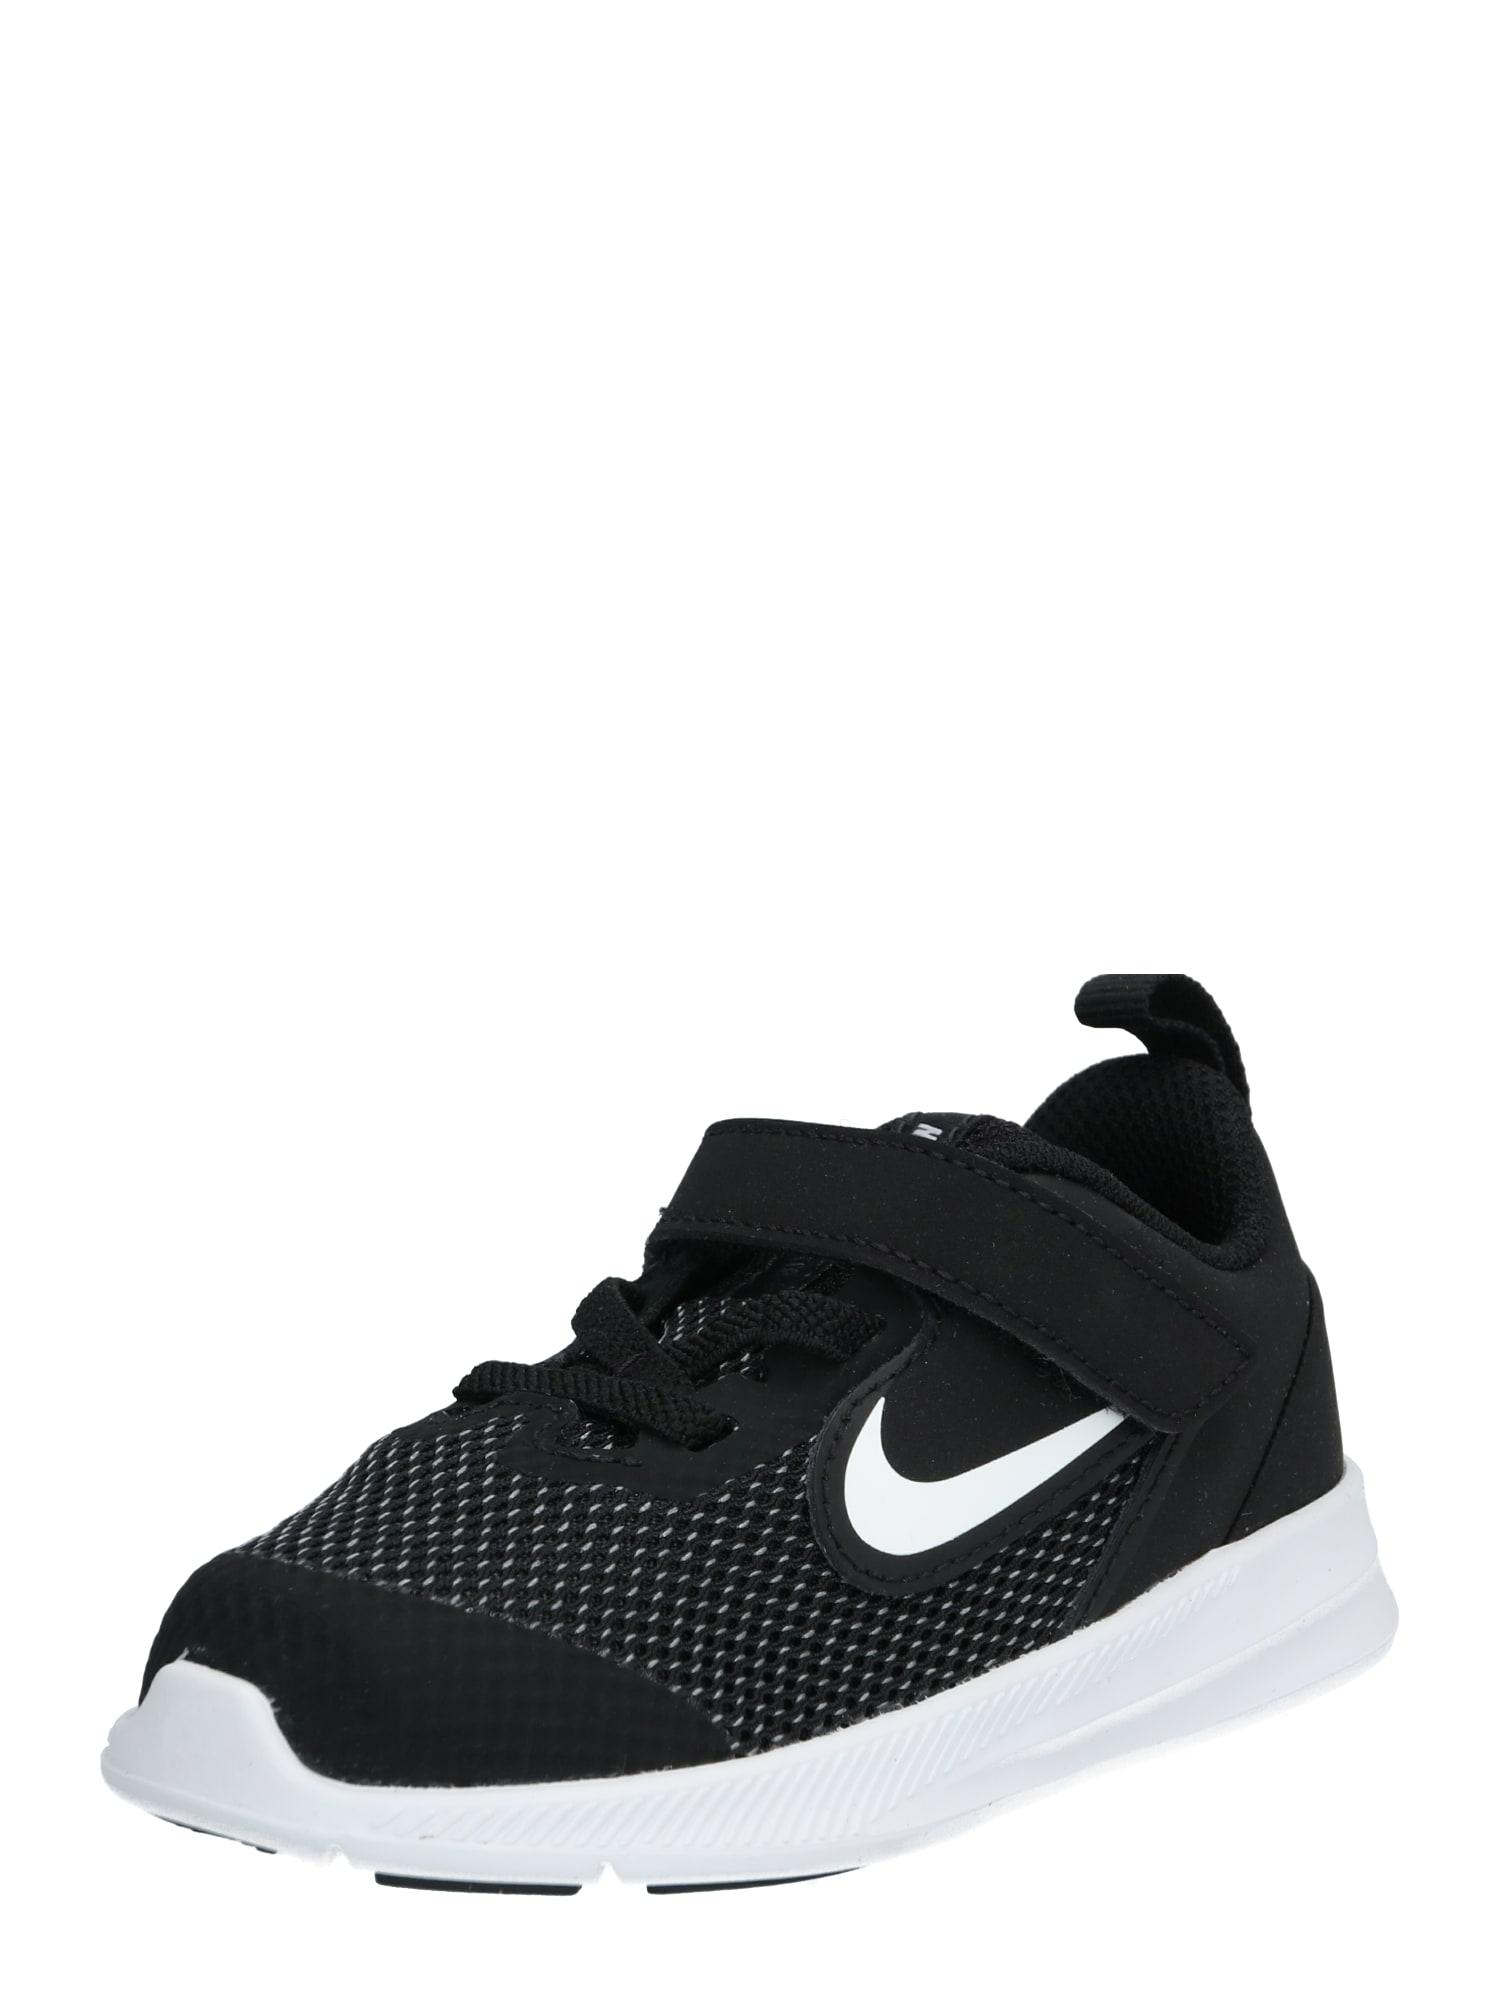 NIKE Sportiniai batai 'DOWNSHIFTER 9 (TDV)' juoda